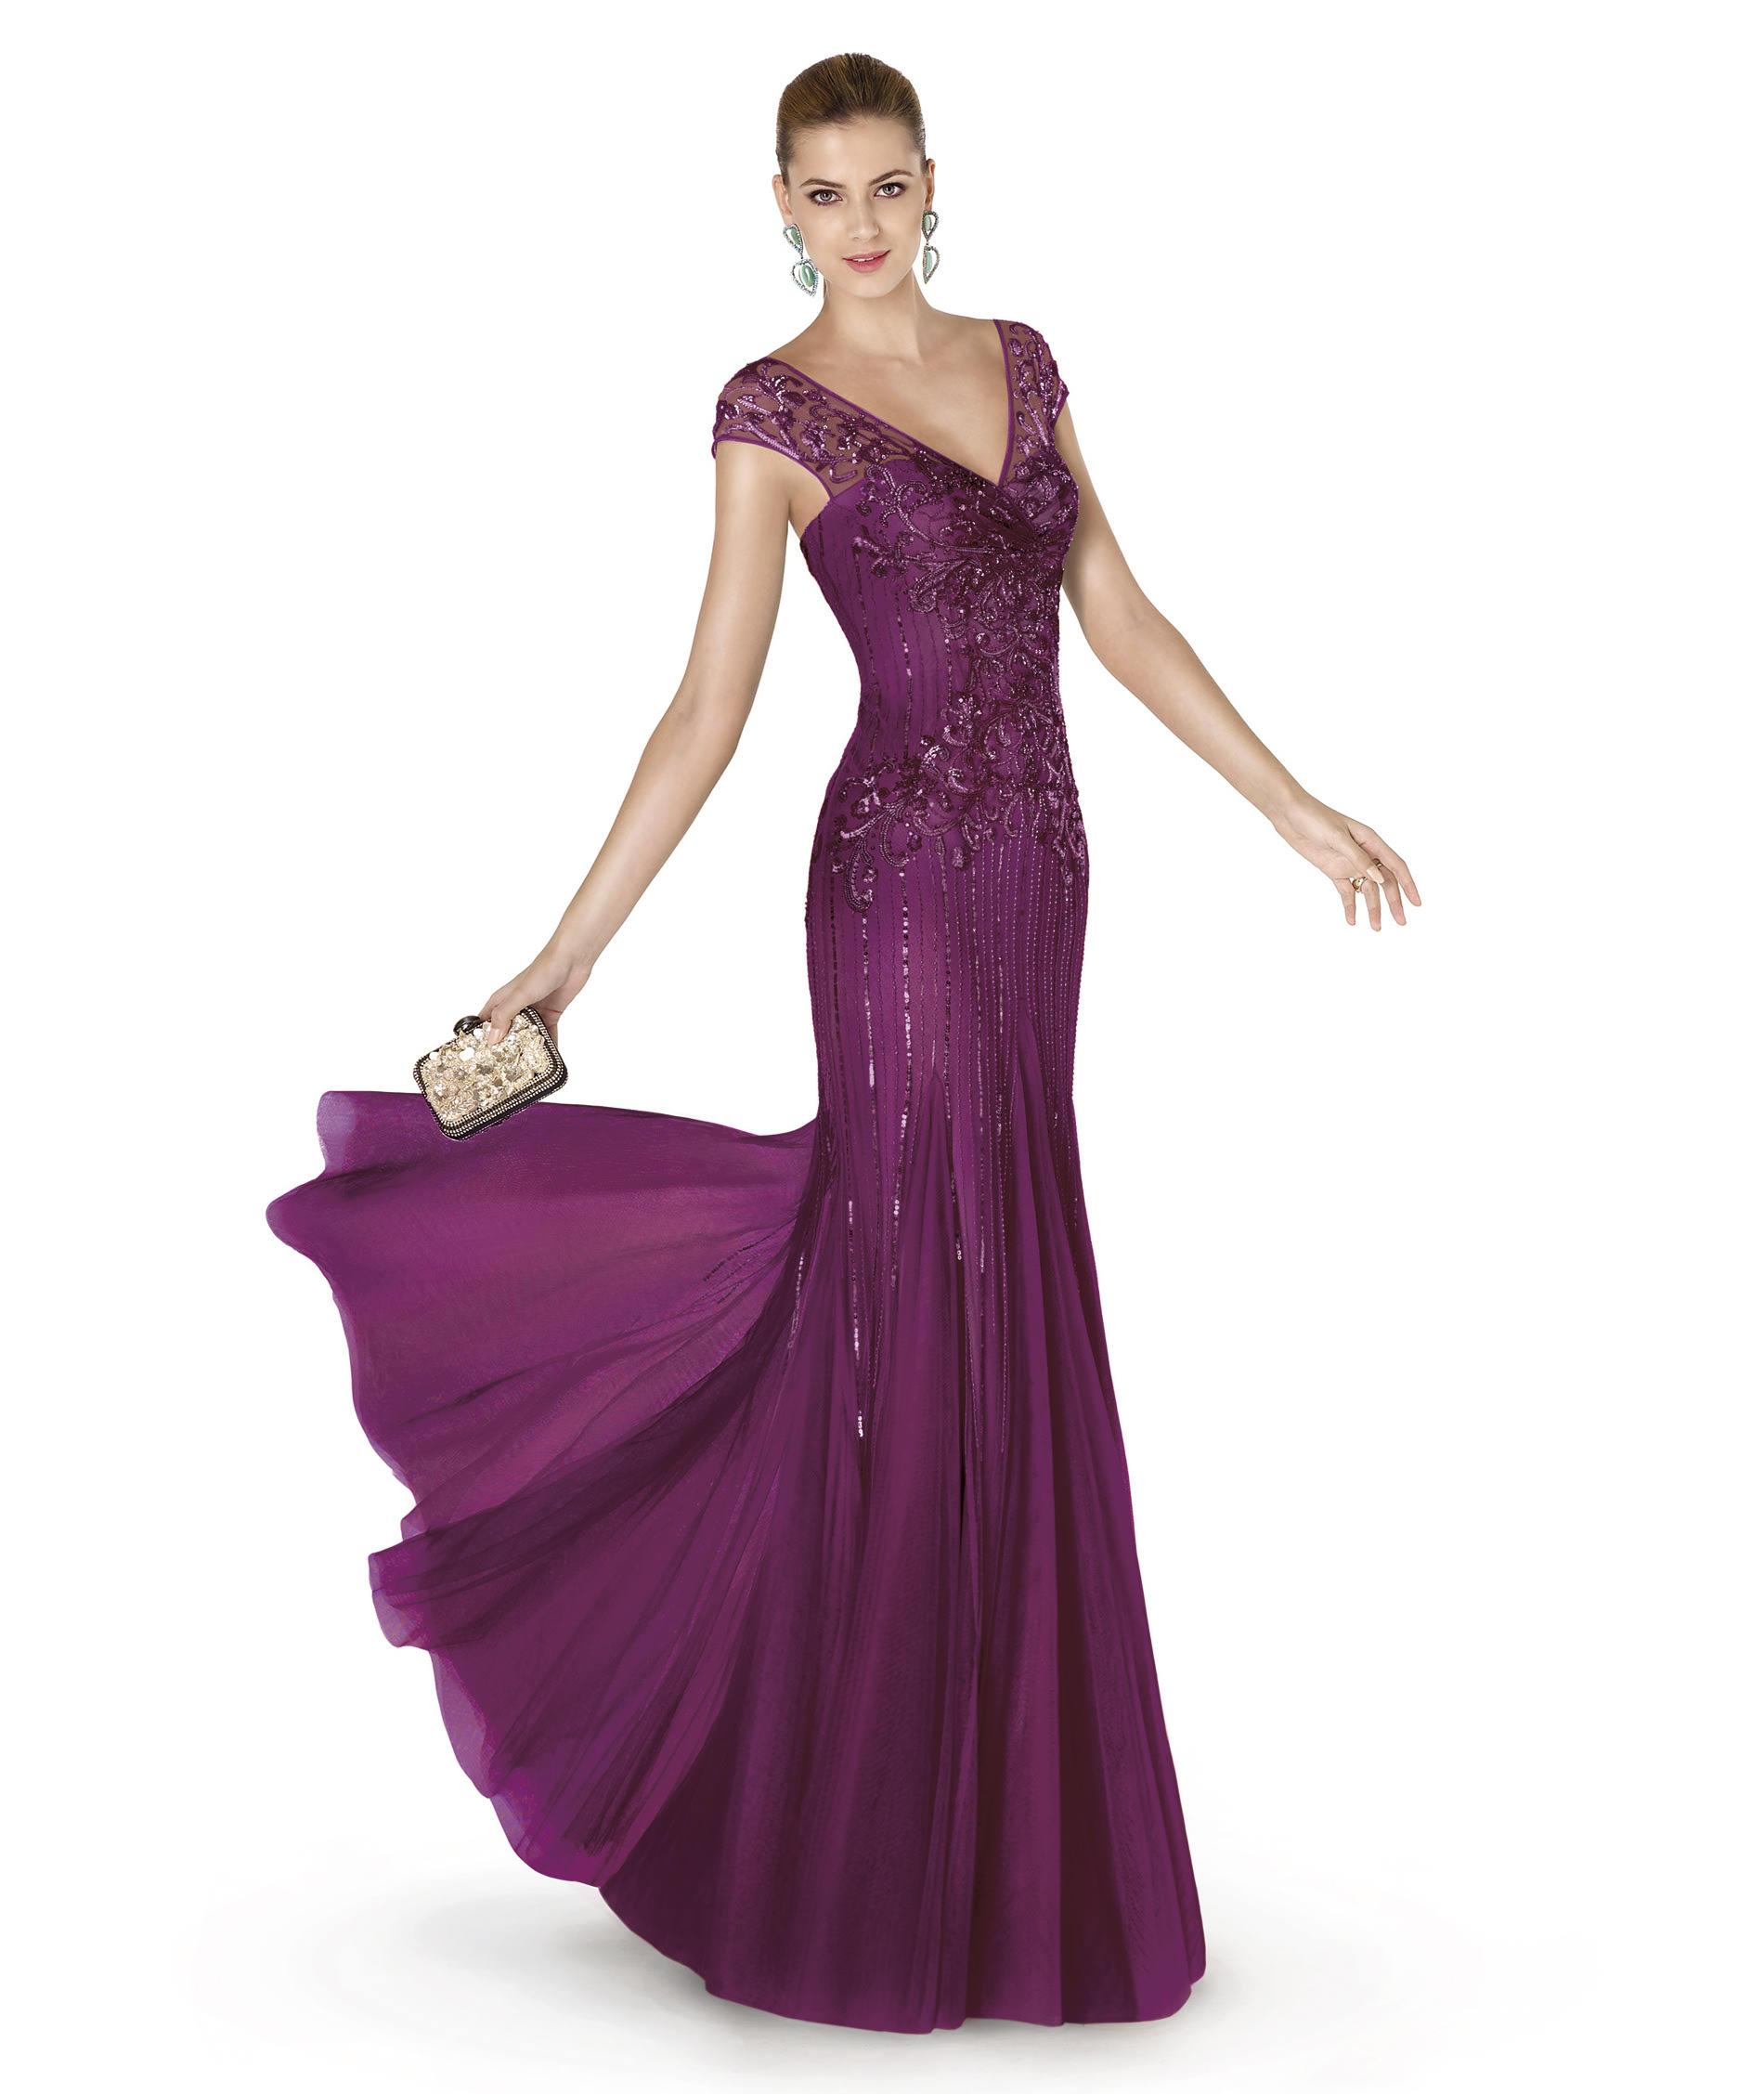 Increíble Vestidos De Fiesta Púrpura 2014 Ideas Ornamento ...